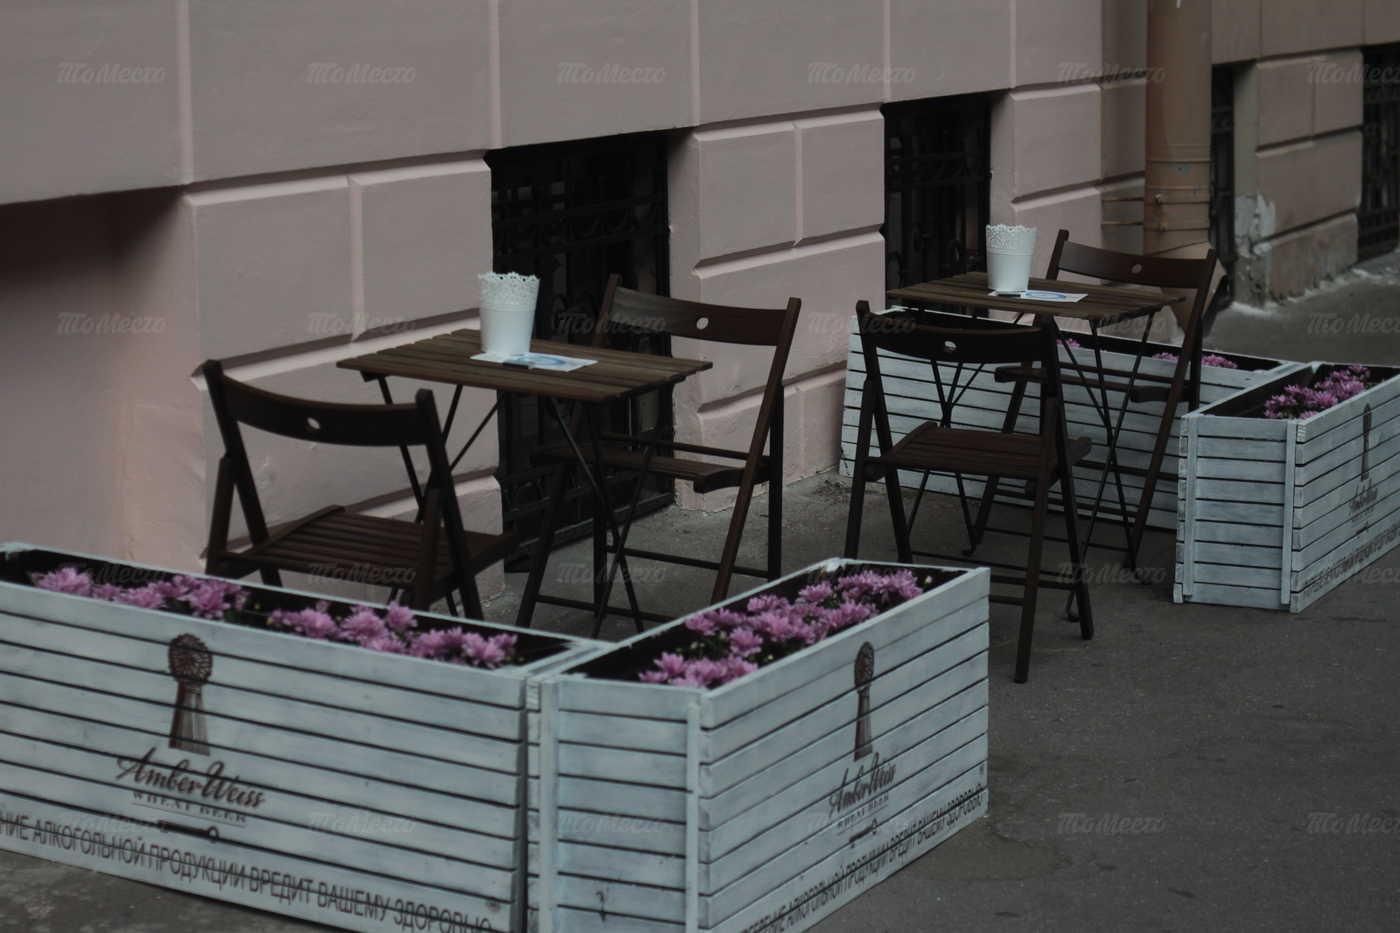 Меню бара, ресторана Liberty (Либерти) на Почтамтской улице